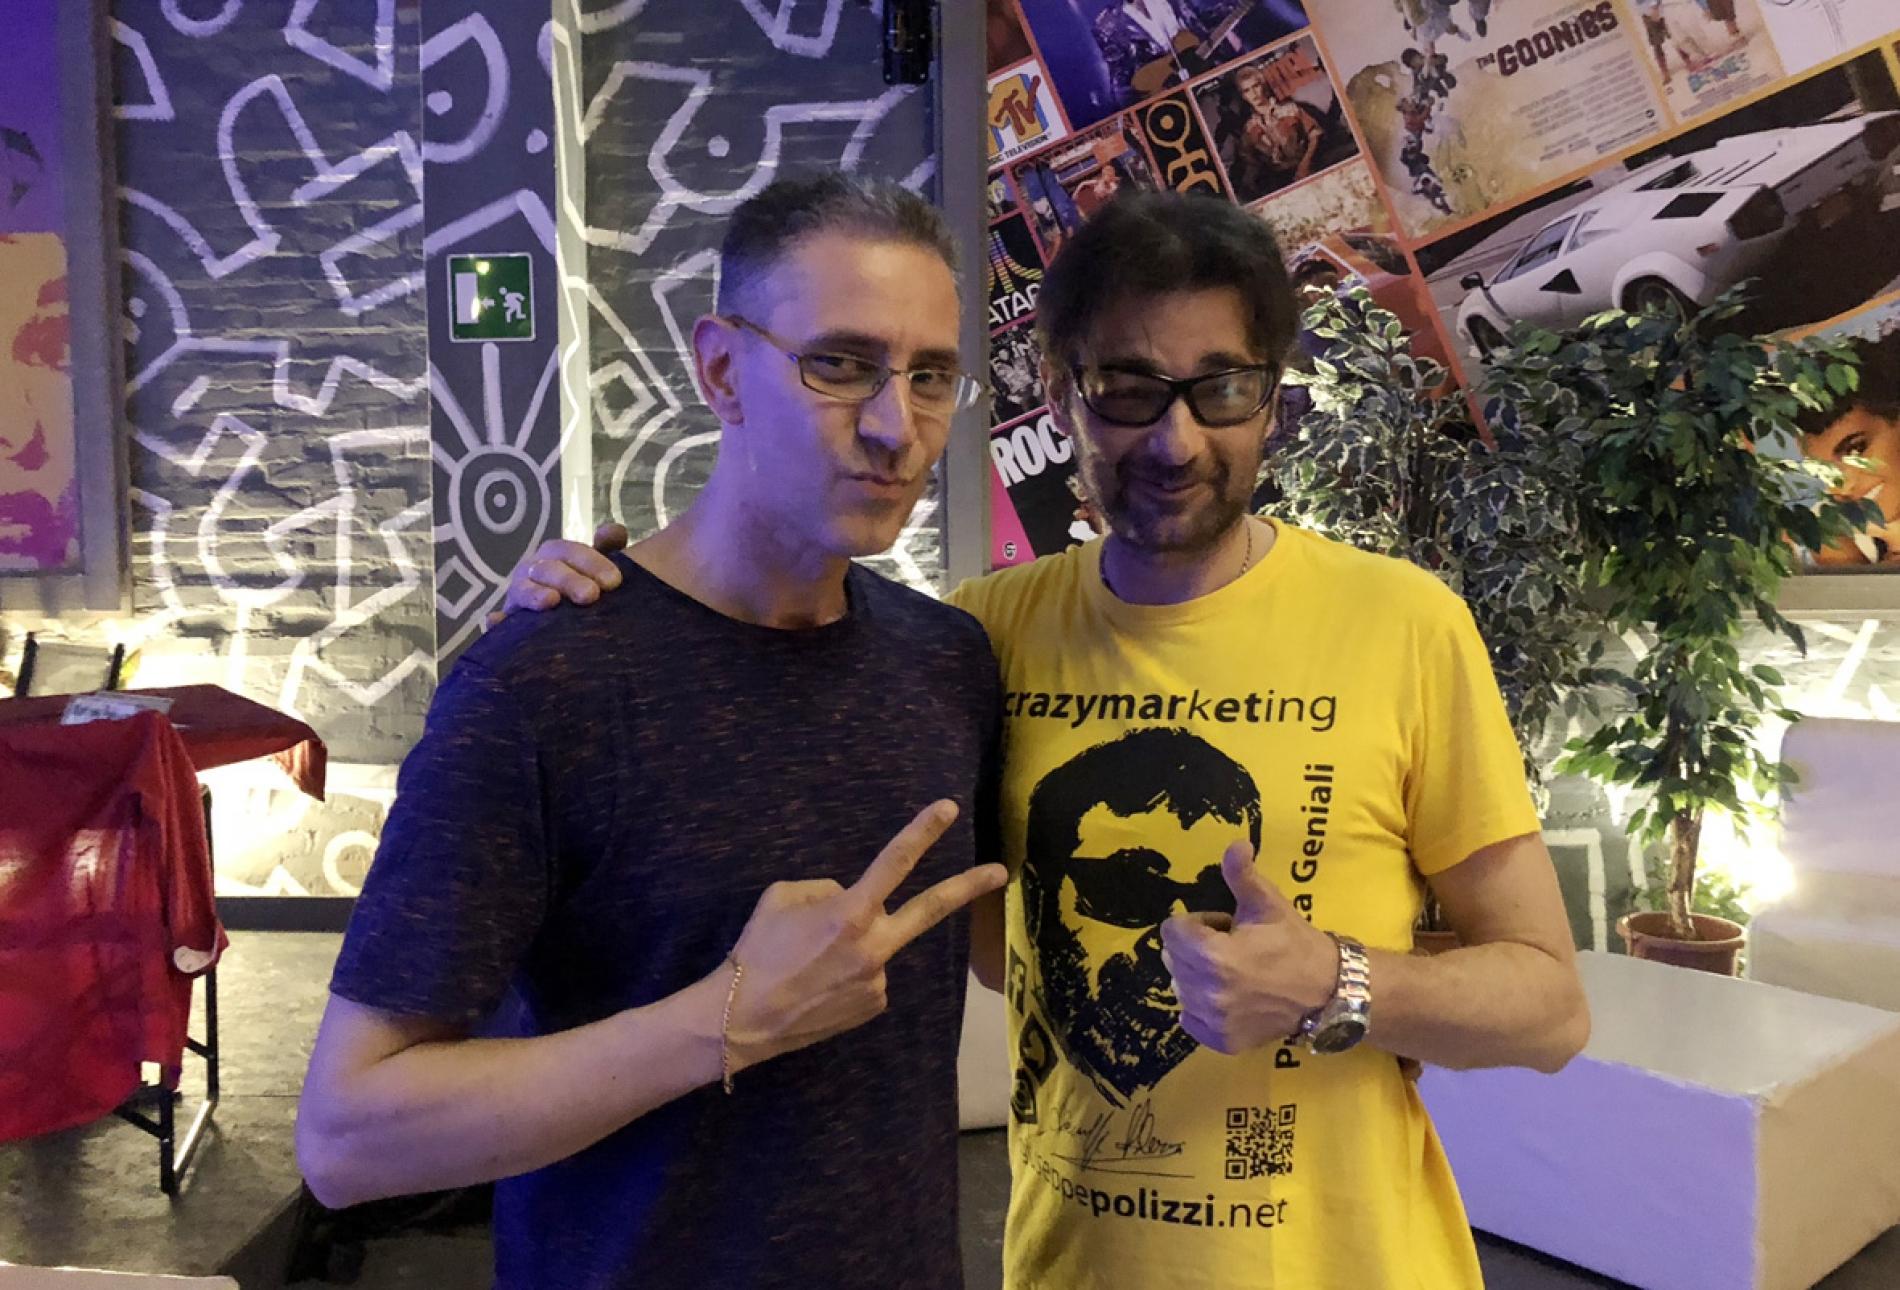 Max Coccobello e Giuseppe Polizzi crazymarketing